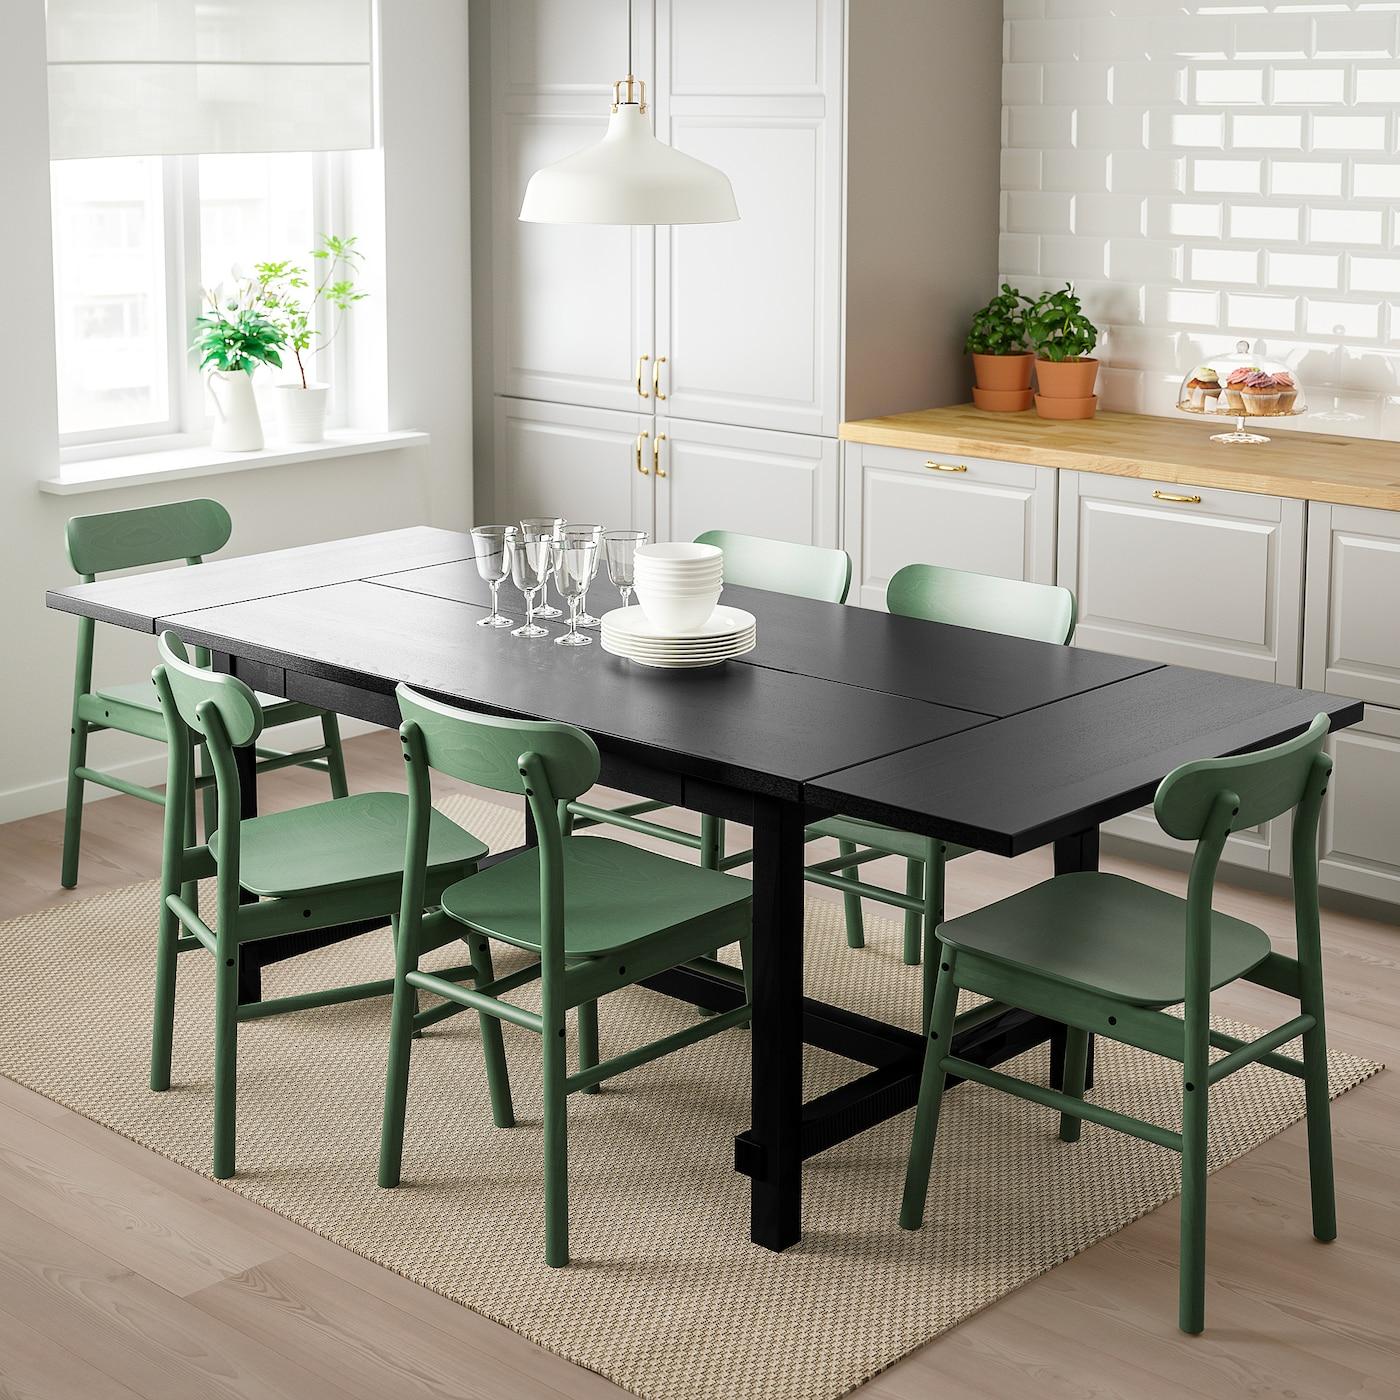 Nordviken Ronninge Table And 4 Chairs Black Green Ikea